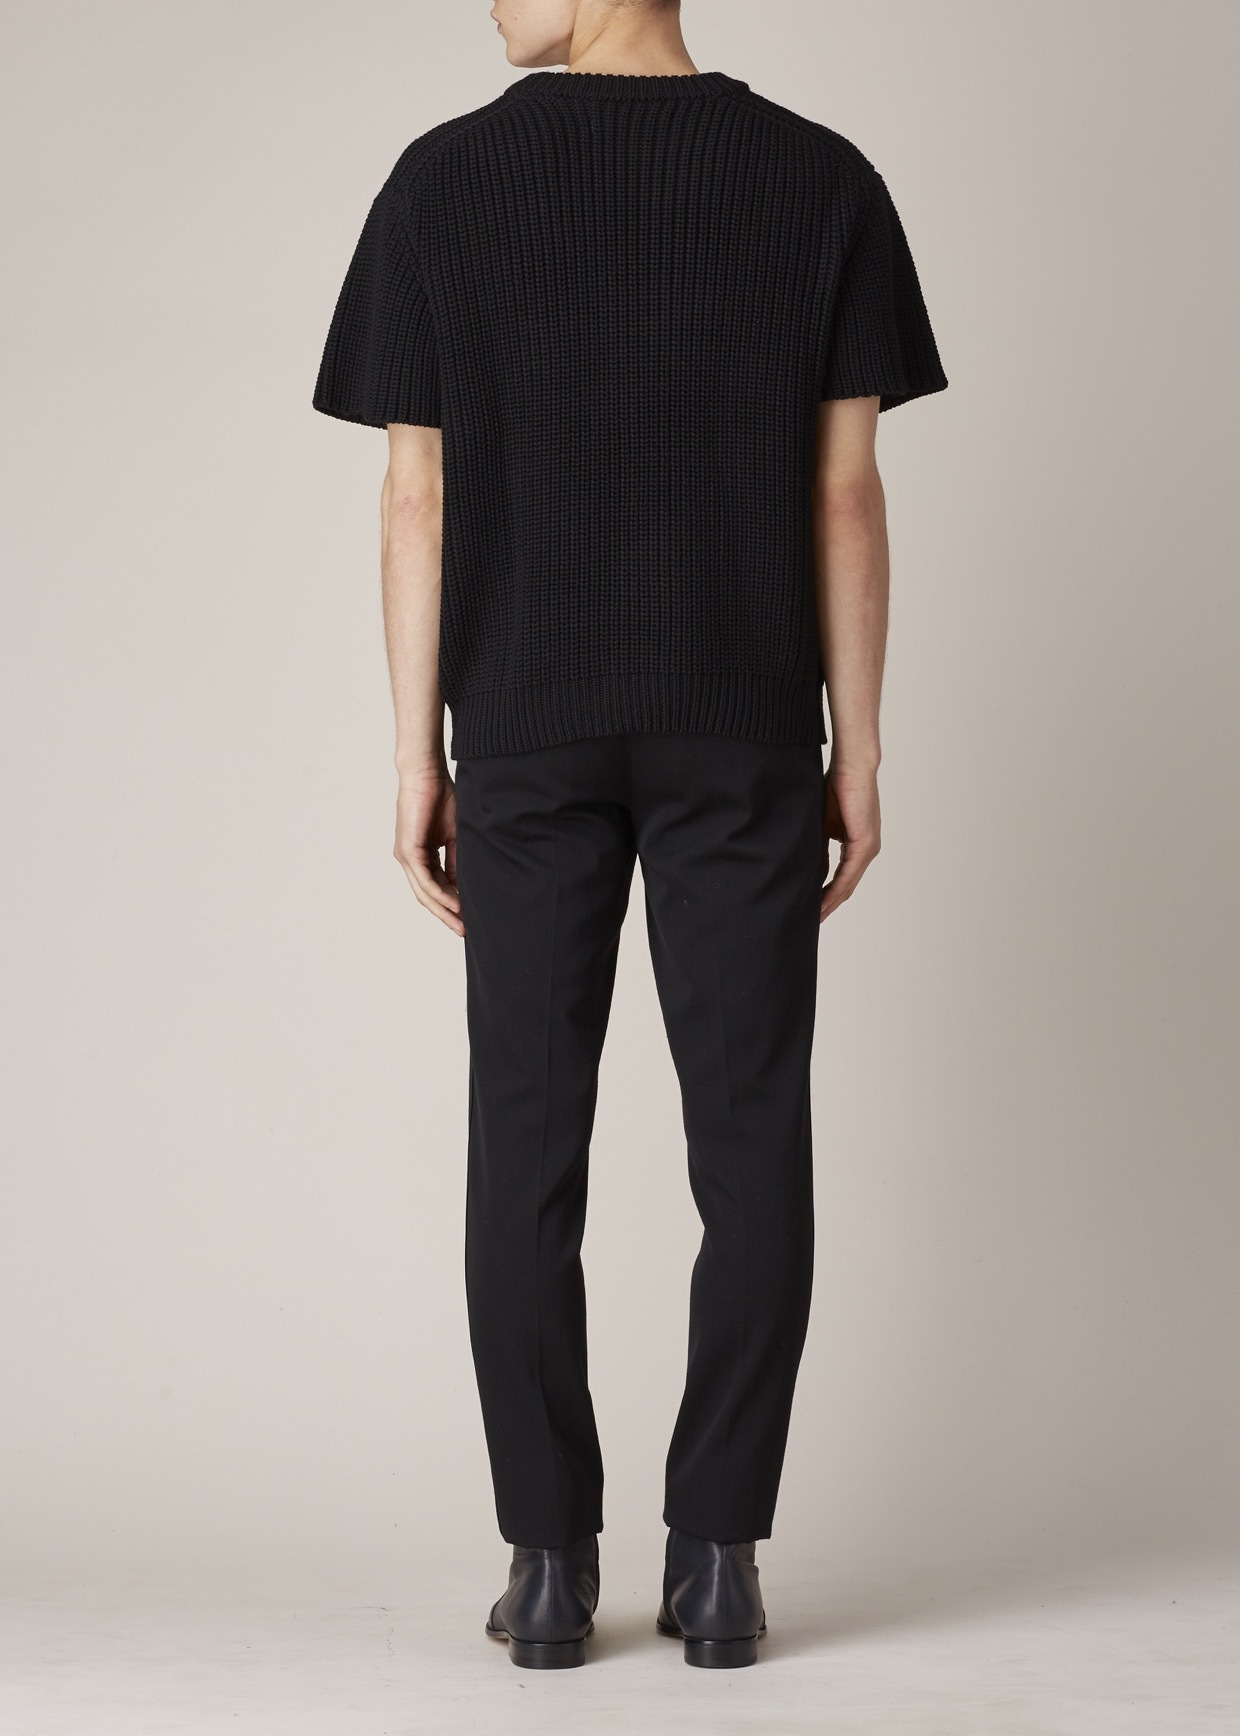 Robert geller Charcoal Short-sleeve Fisherman Sweater in Black for ...